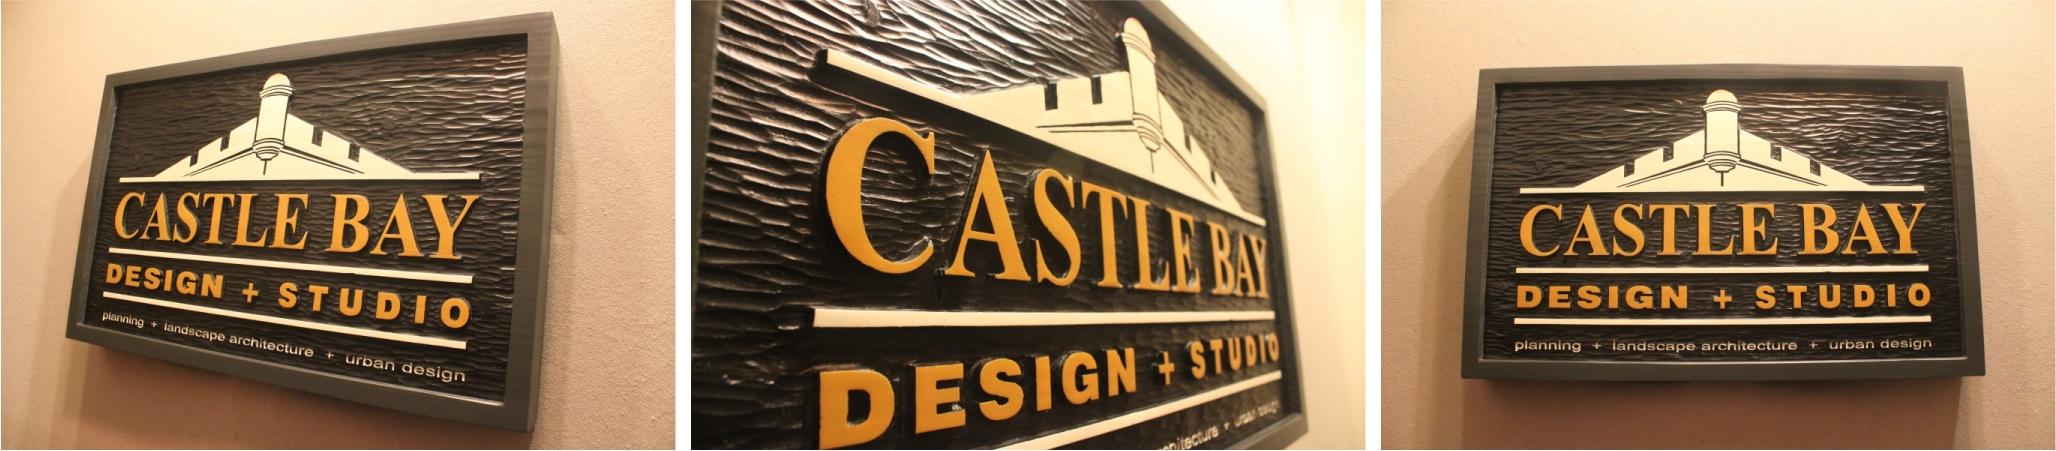 Castle Bay FWS.jpg